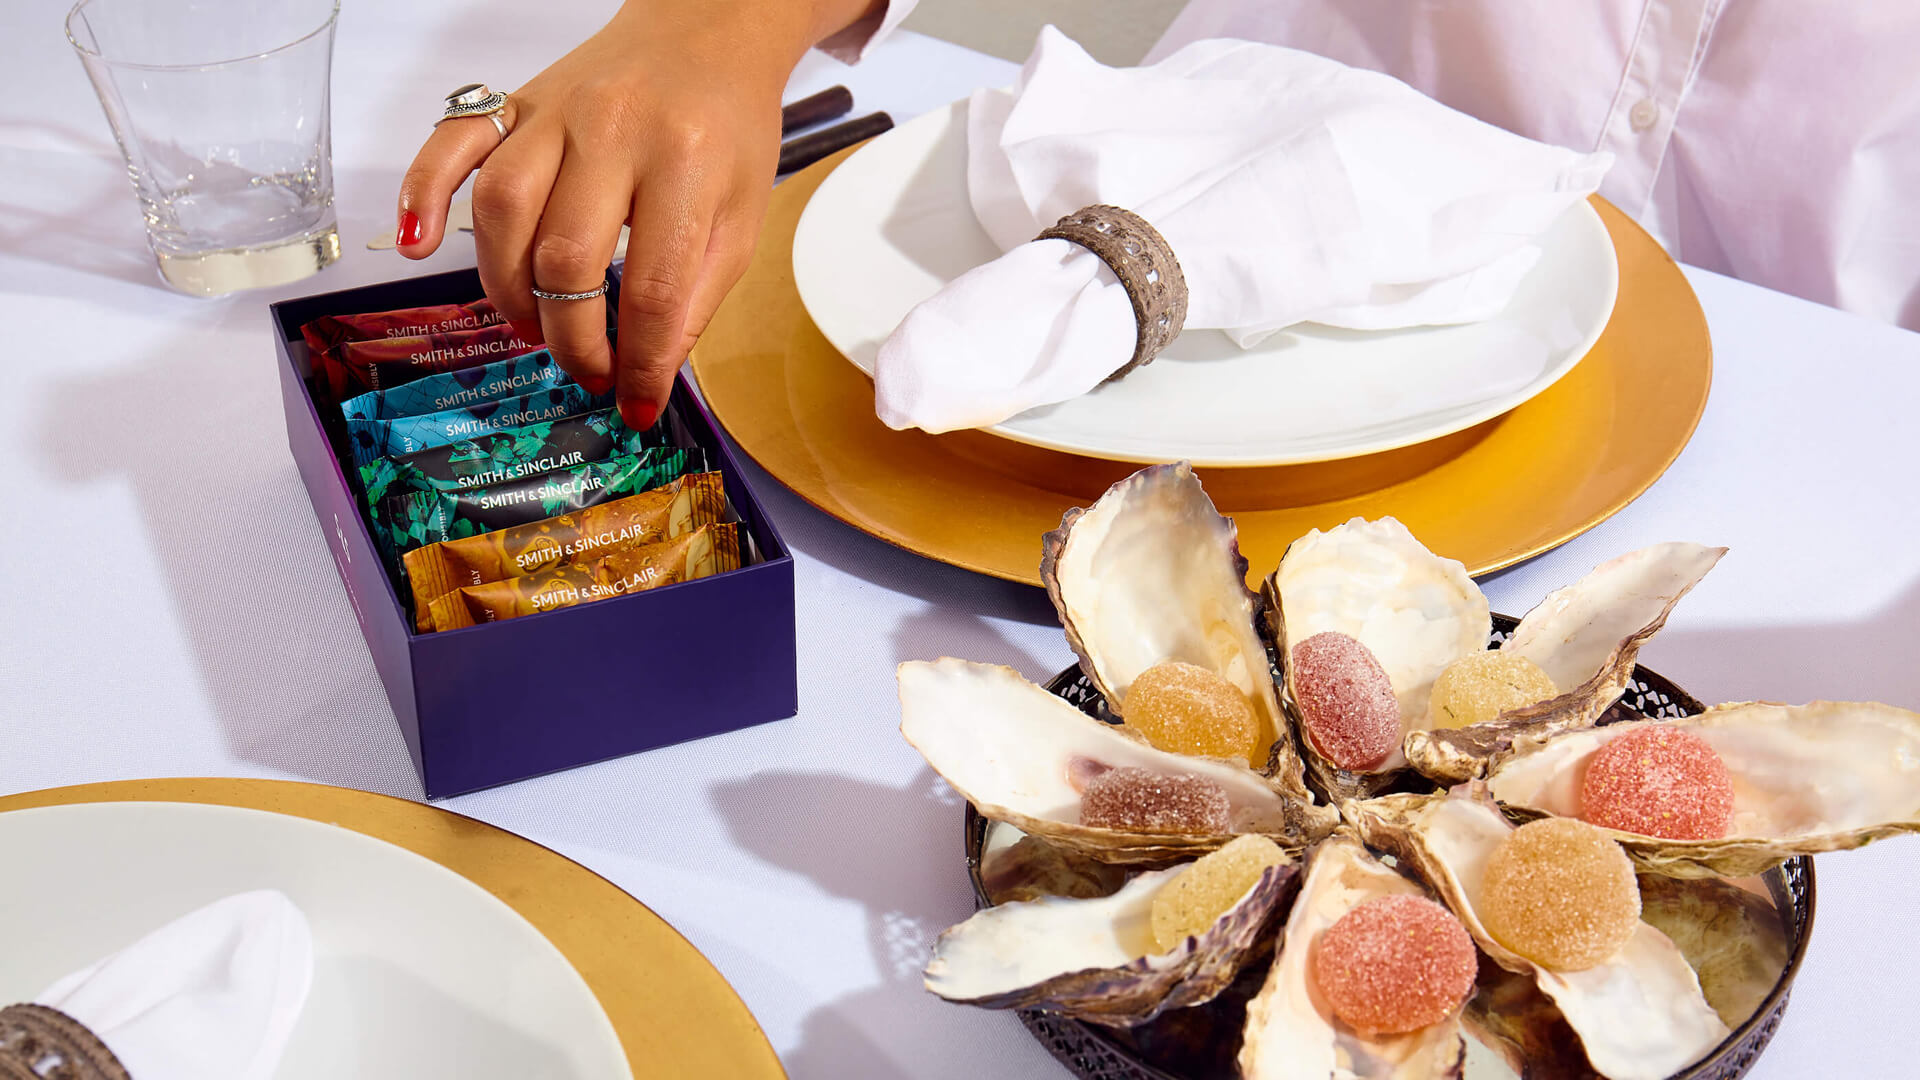 Smith & Sinclair - Lux Life luxury lifestyle magazine